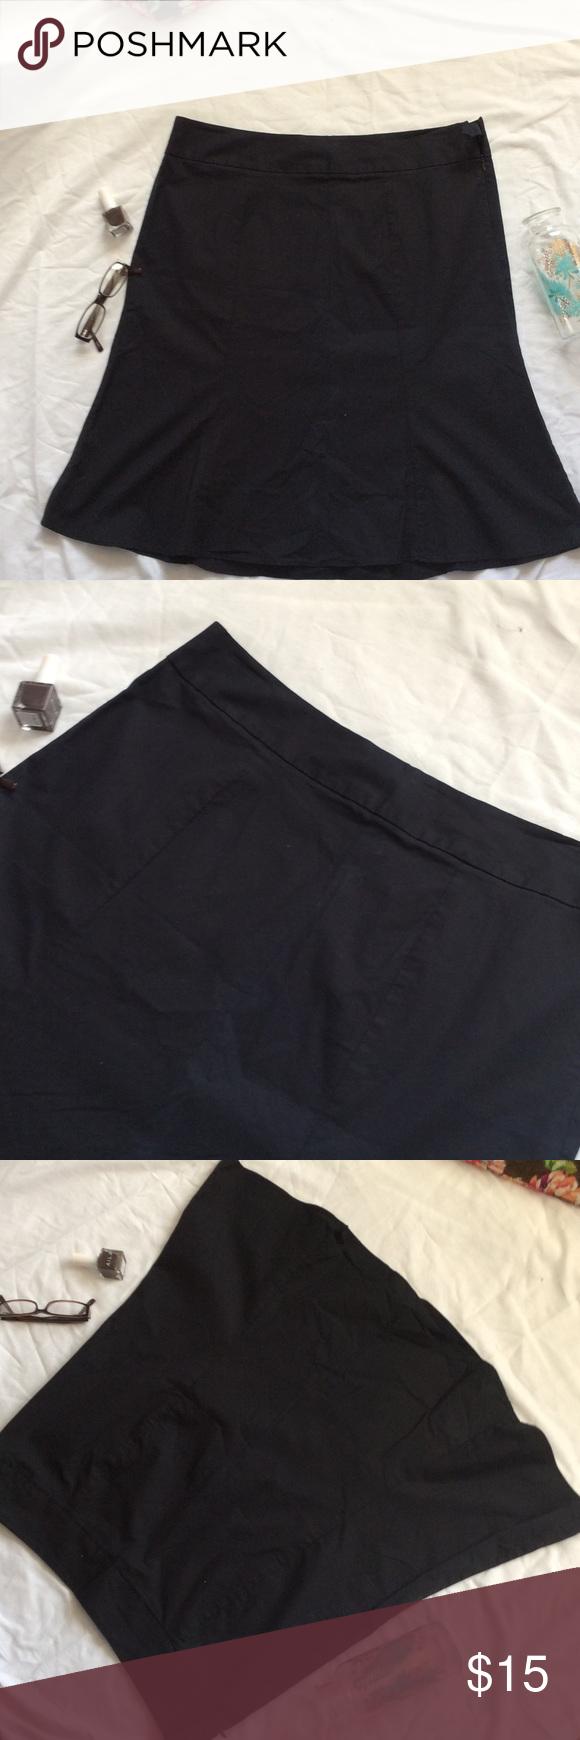 Black side zipper gap size 16 skirt Black gap size 16 skirt. Cotton/ spandex blend. Side zipper. Good condition. No trades. GAP Skirts